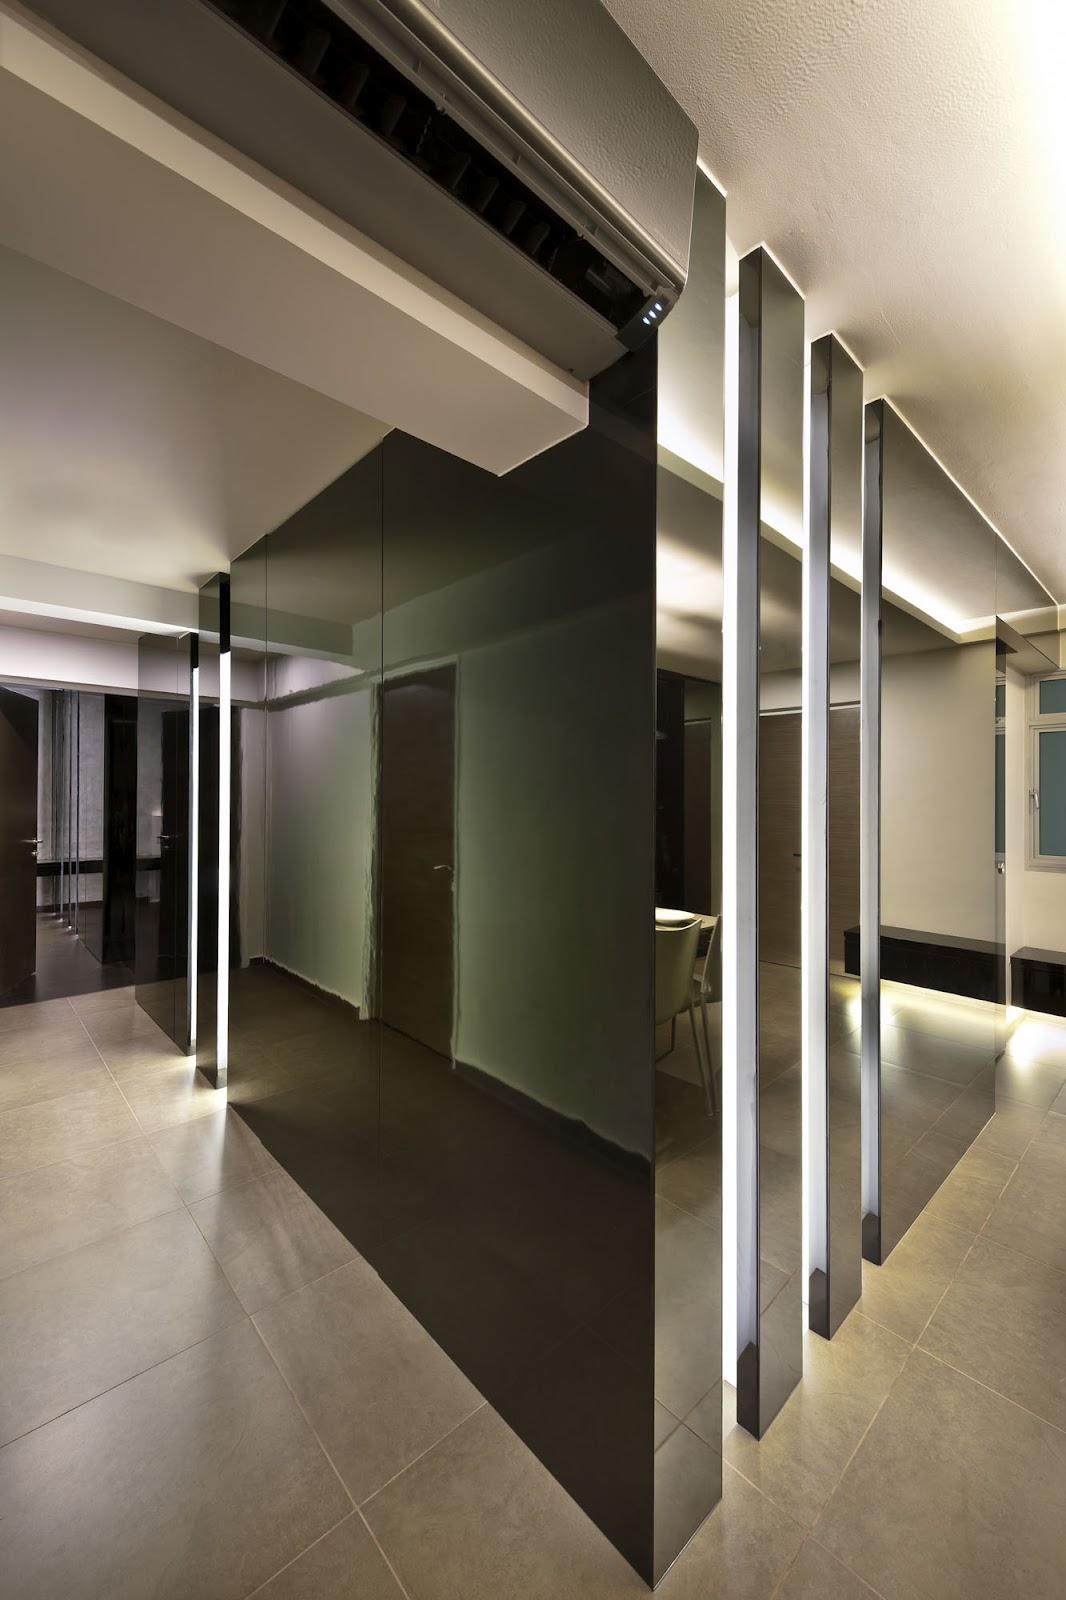 Hdb Living Room Decorating Ideas: Rezt & Relax Interior Design: 4-Room HDB